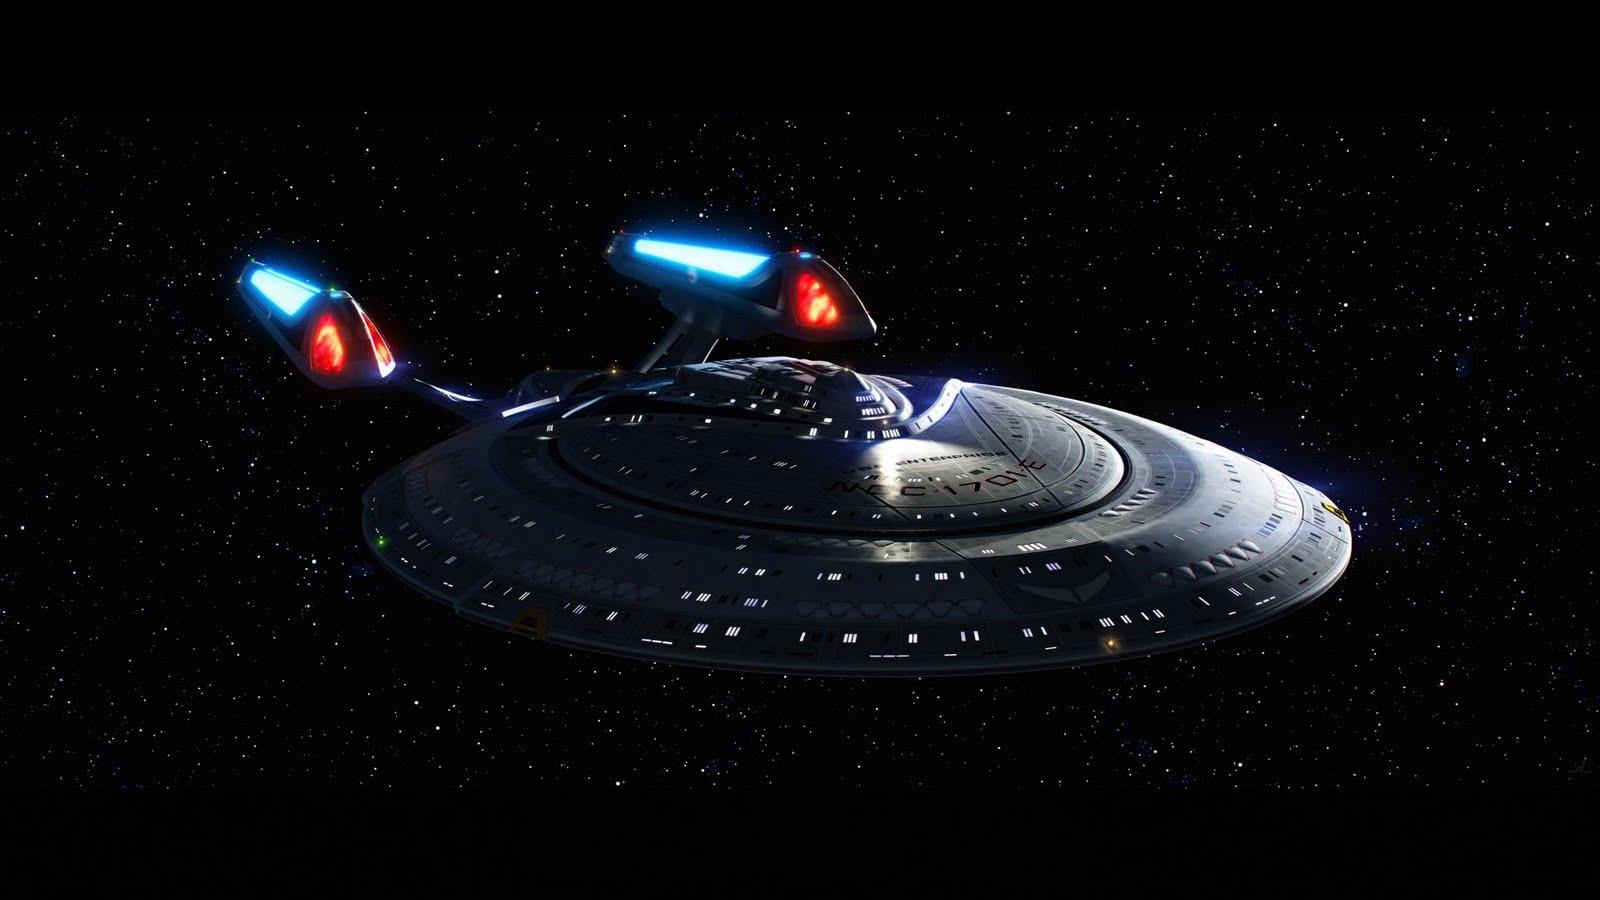 Star Trek Wallpapers - Star Trek - Sci Fi Blog.